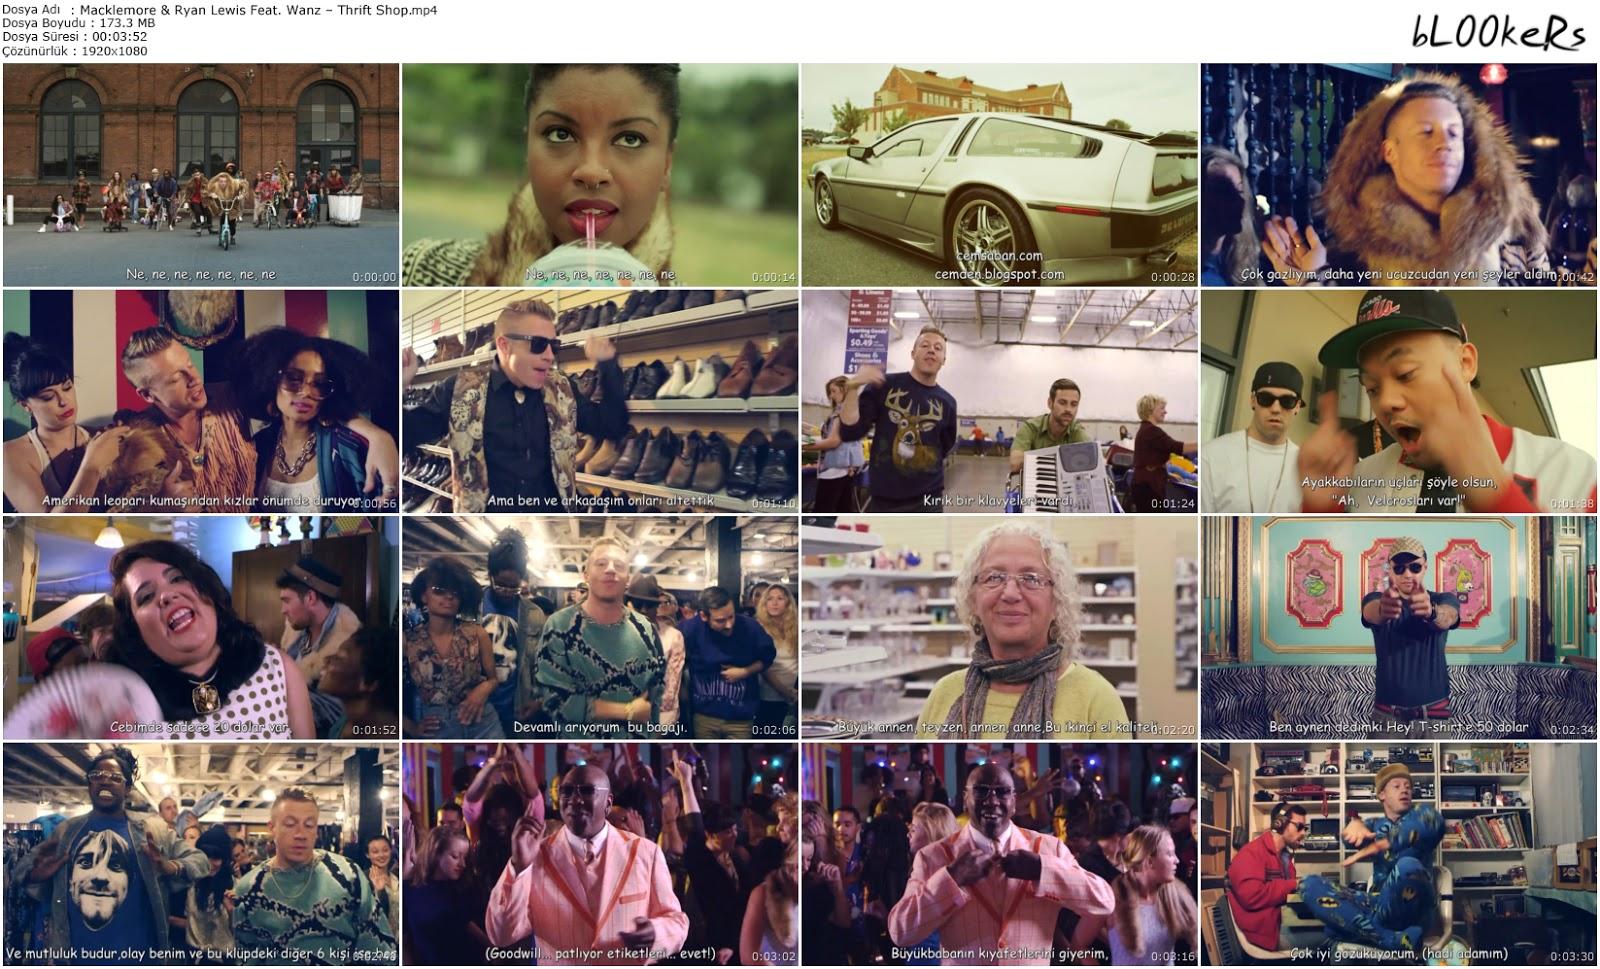 Macklemore & Ryan Lewis Feat. Wanz – Thrift Shop (Türkçe Altyazılı - bL00keRs)